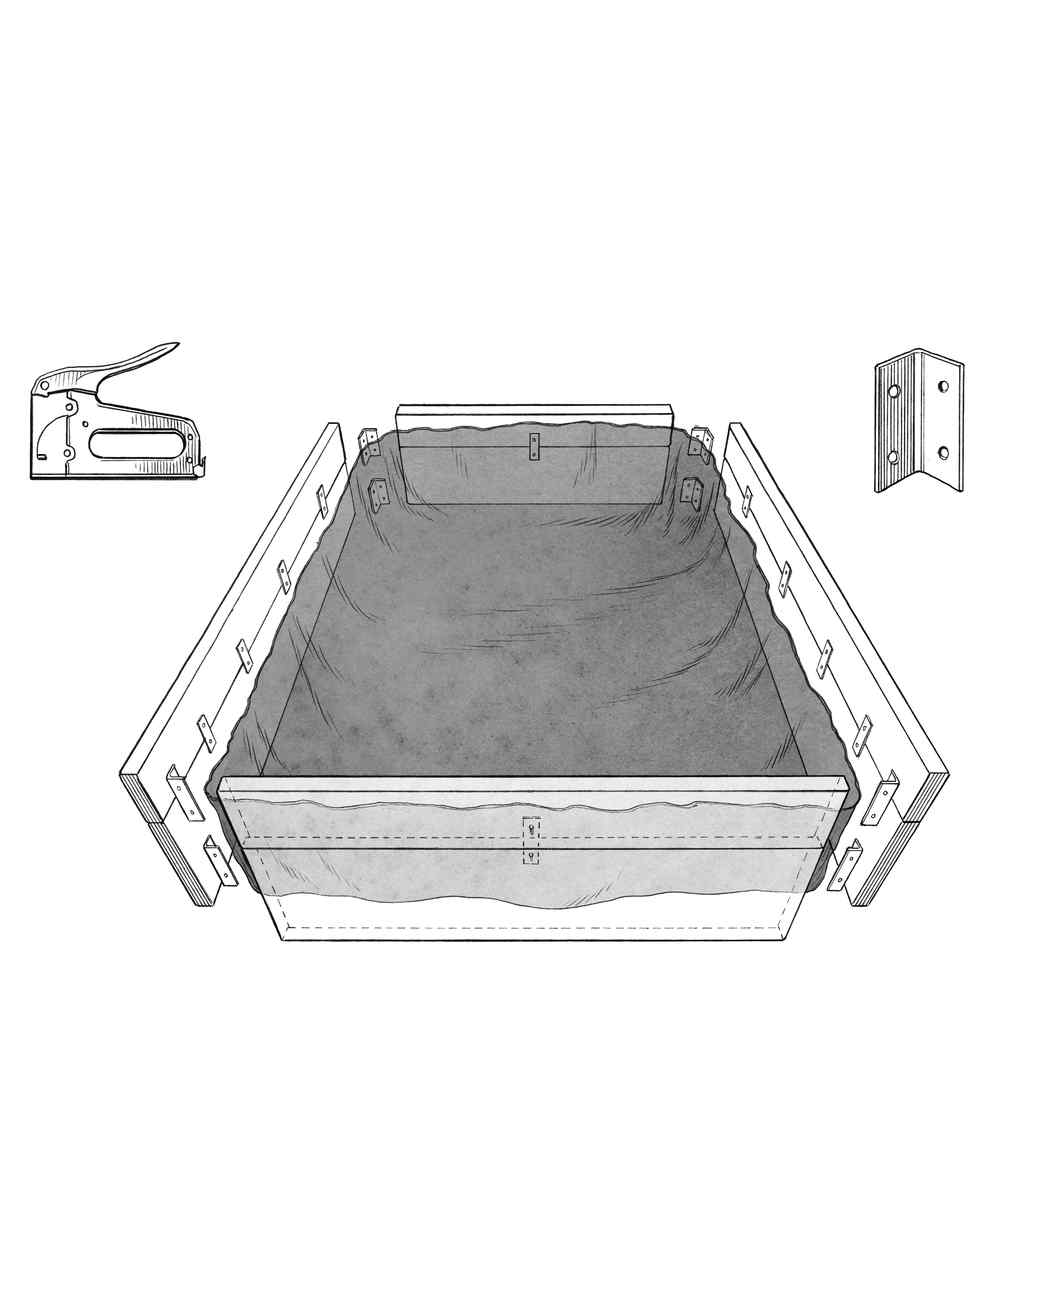 small resolution of how to build a raised garden bed martha stewart pallet raised garden bed diagram of raised garden bed